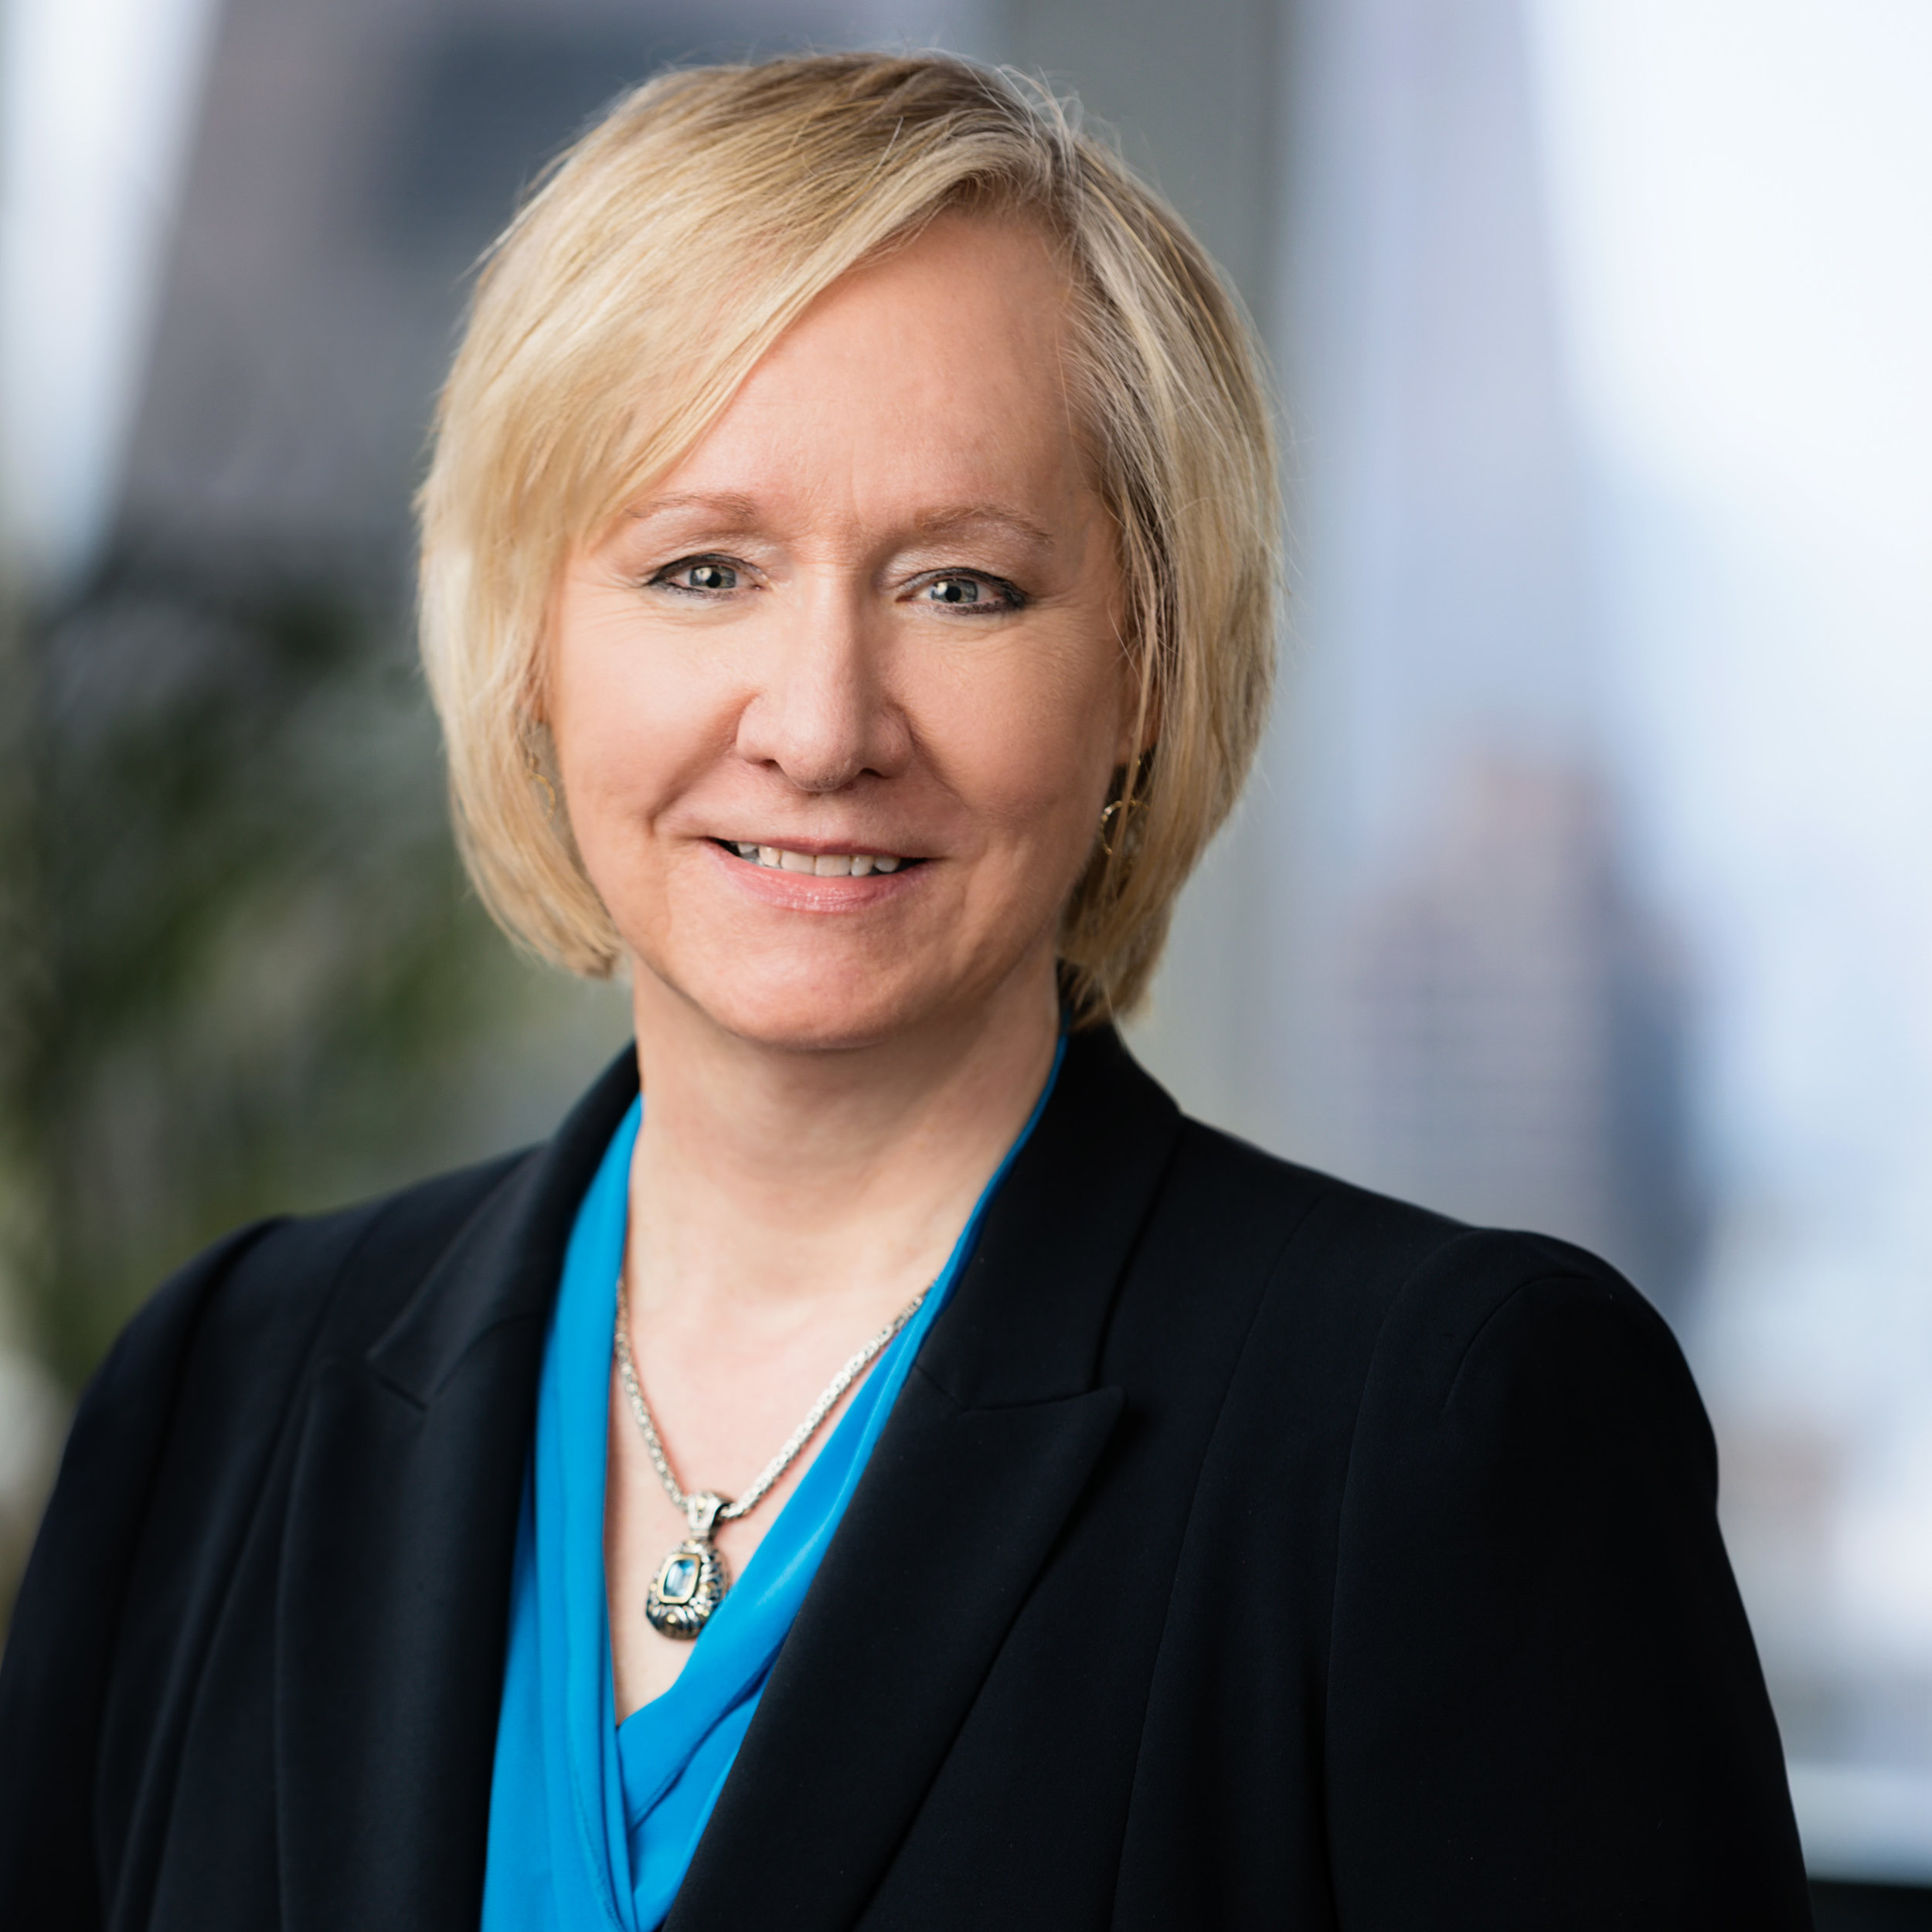 Lynne Born - chief executive officer212-605-3145lborn@pwcpa.comDOWNLOAD V-CARD ⬇